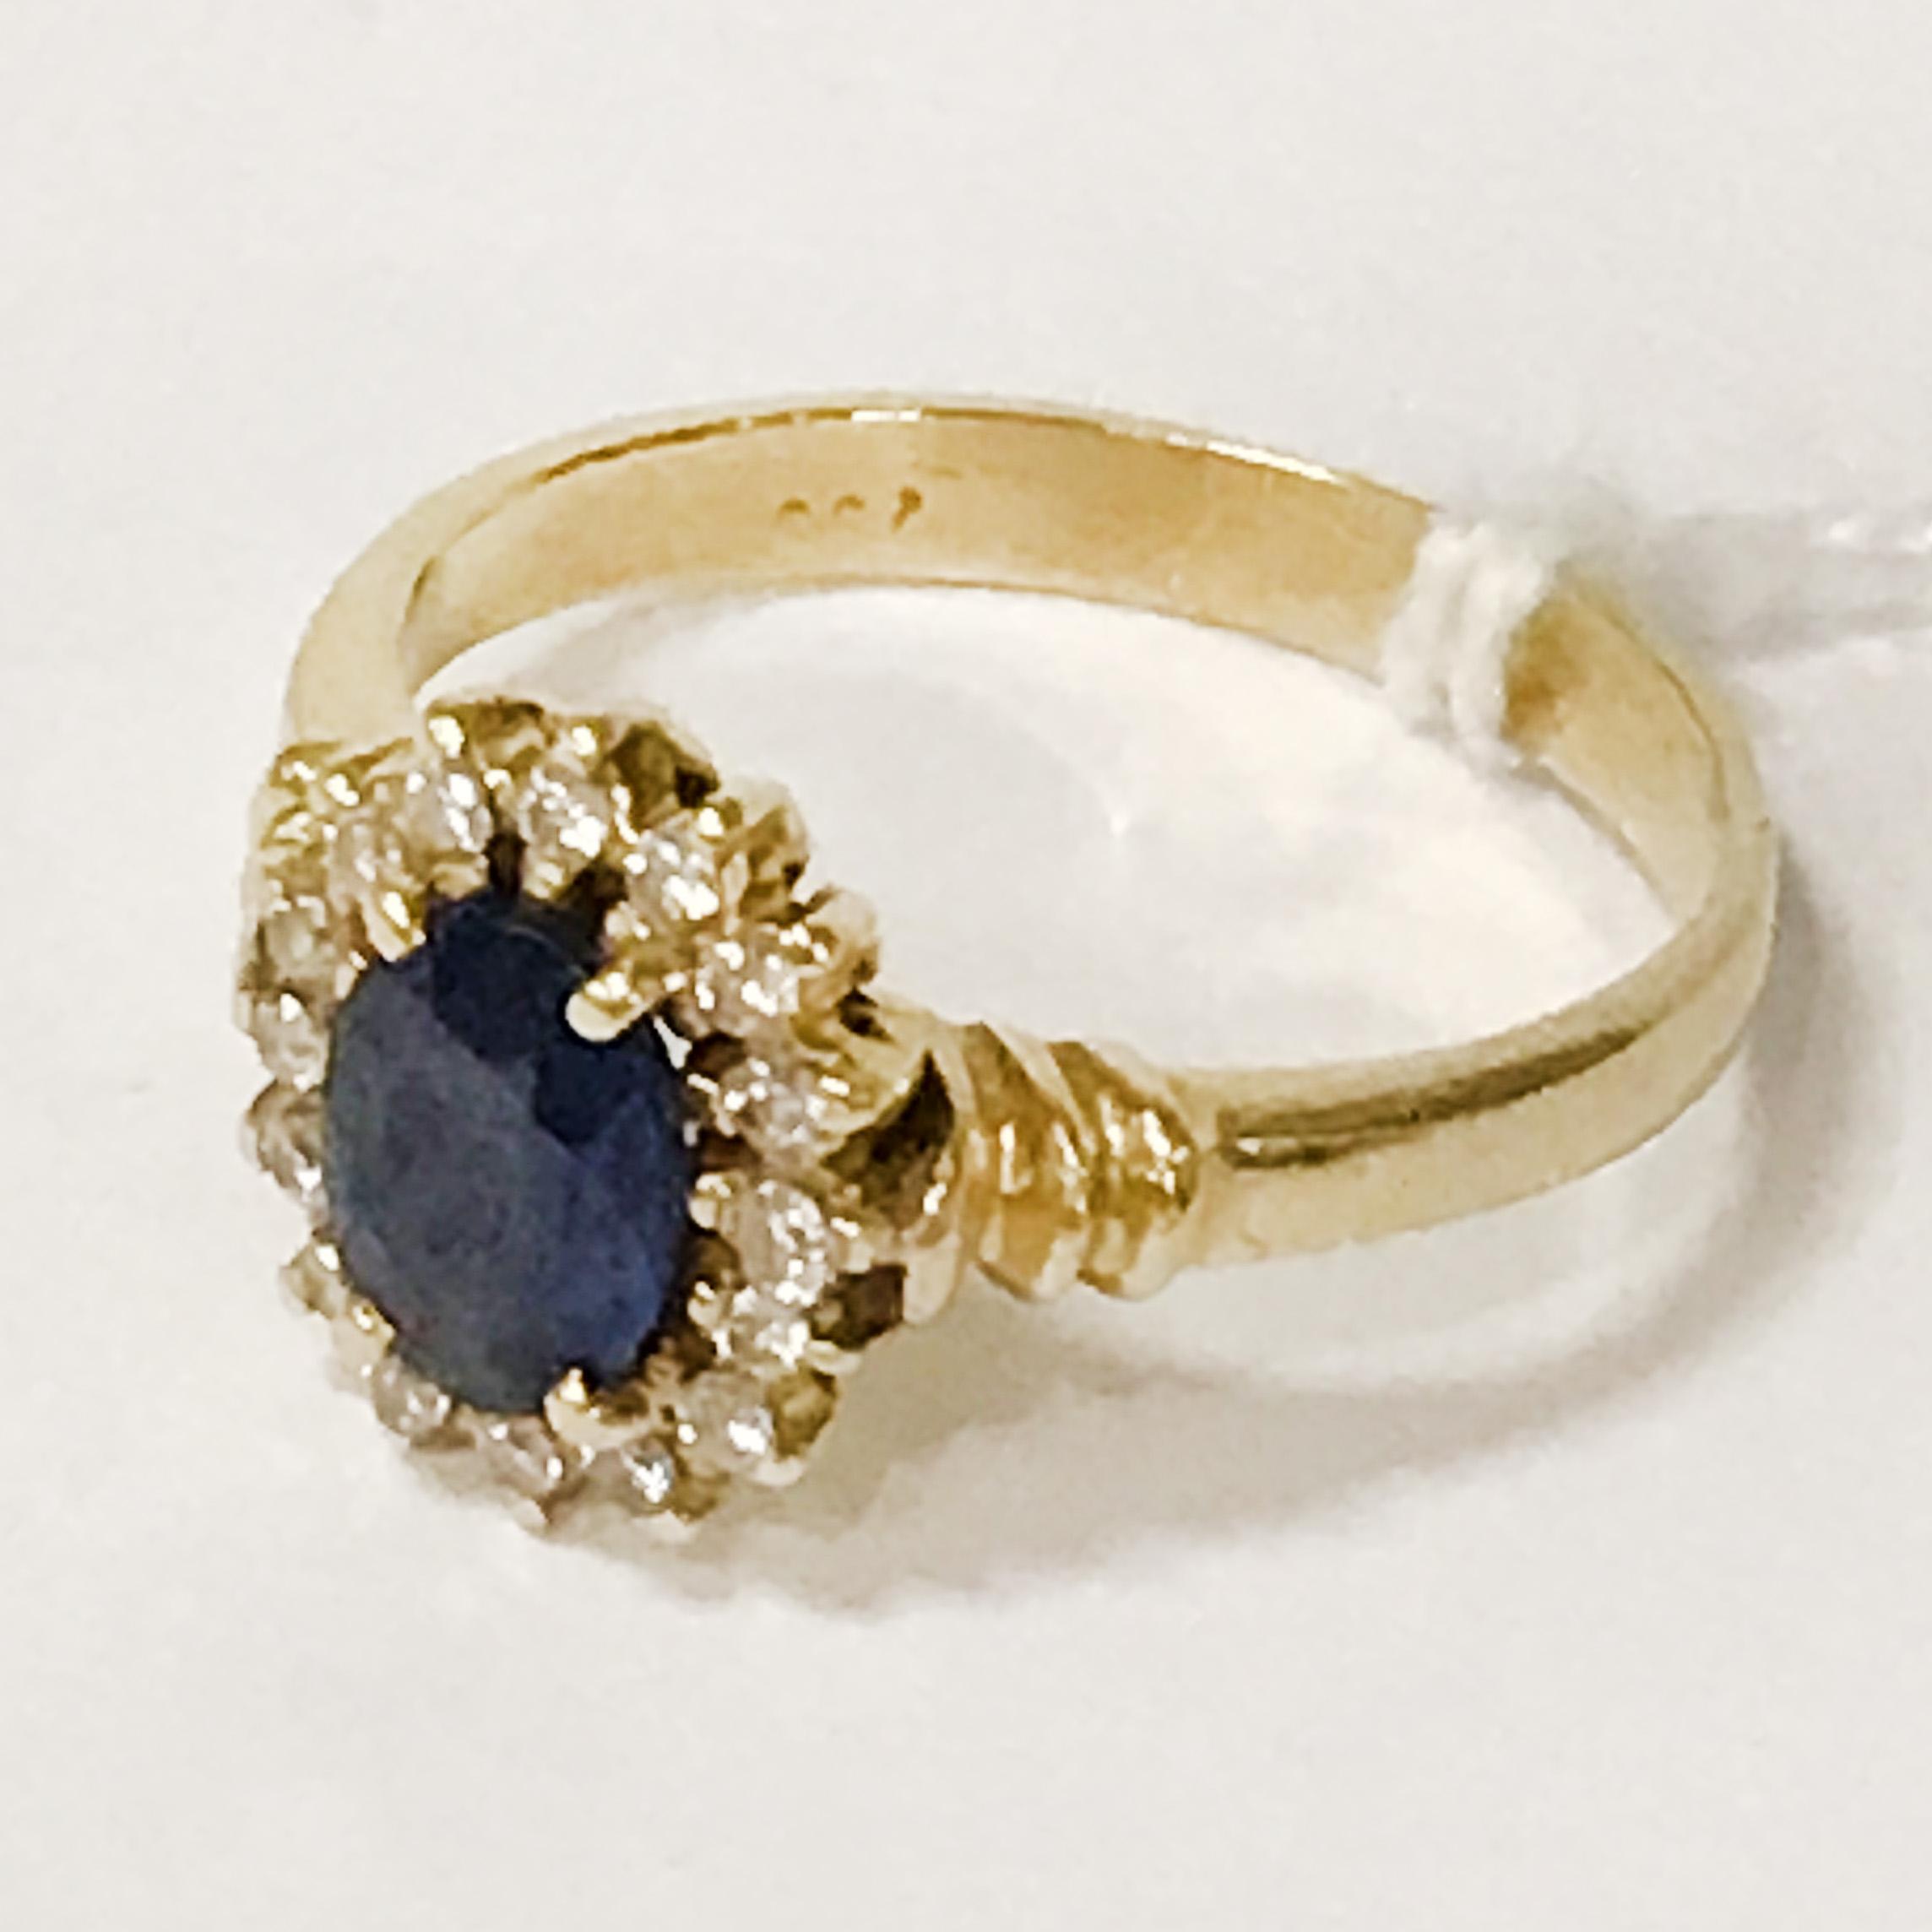 18CT YELLOW GOLD SAPPHIRE & DIAMOND RING - SIZE N